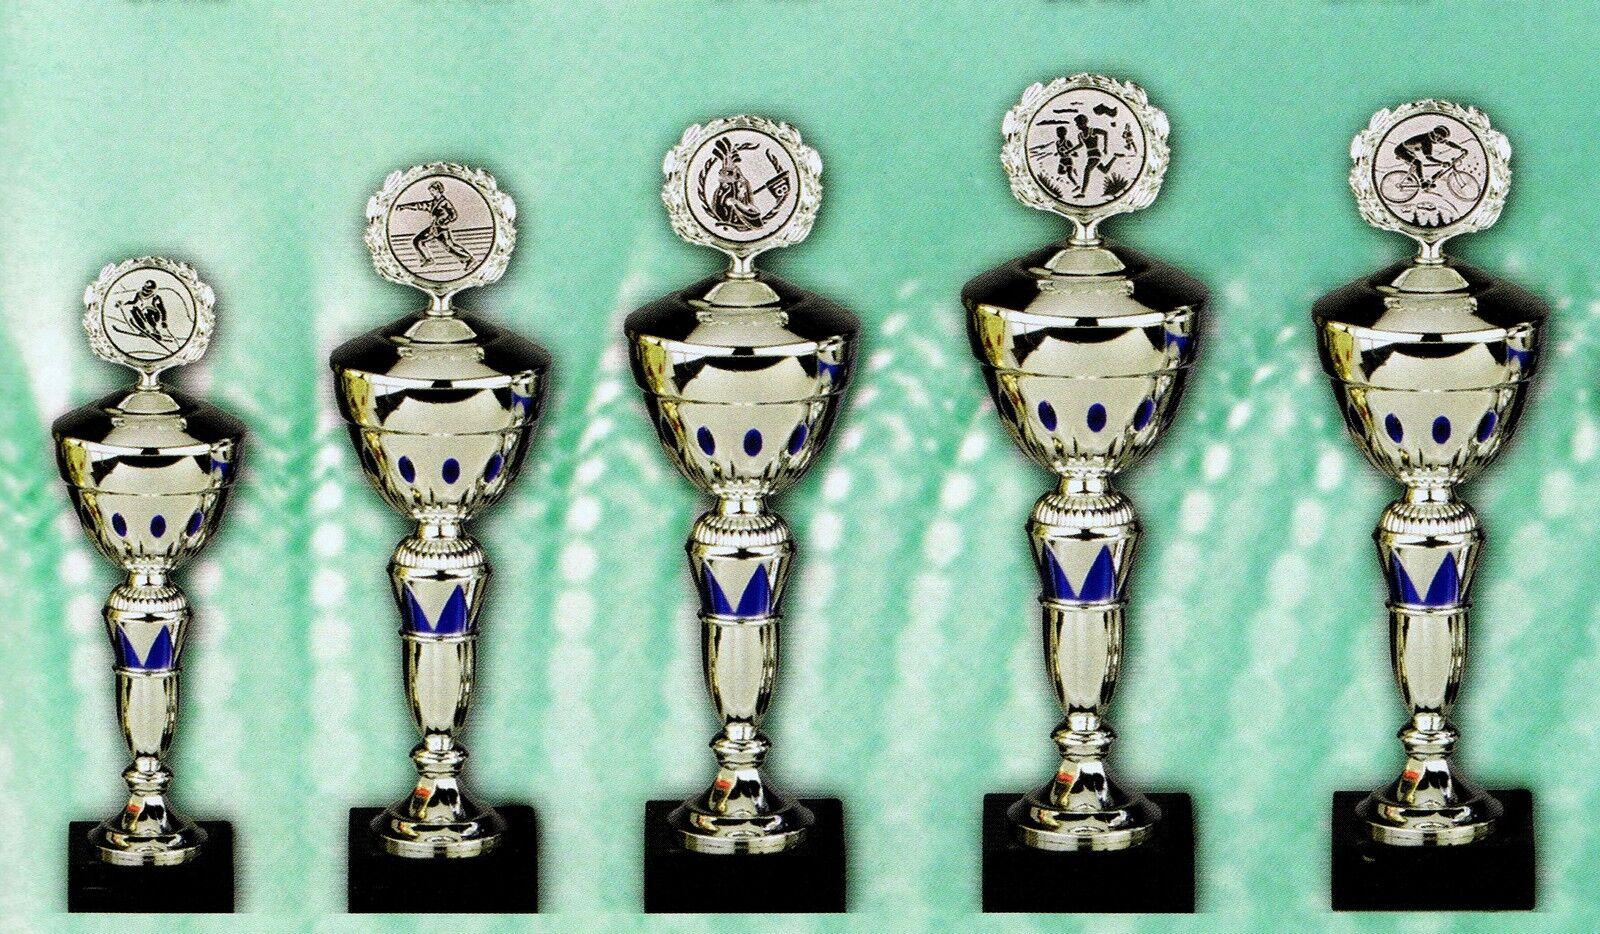 Pokal-Serie 5Pokale & Gravur Gravur Gravur & Emblem Vereinspokal Sportauszeichnung Wanderpokal 1facd5